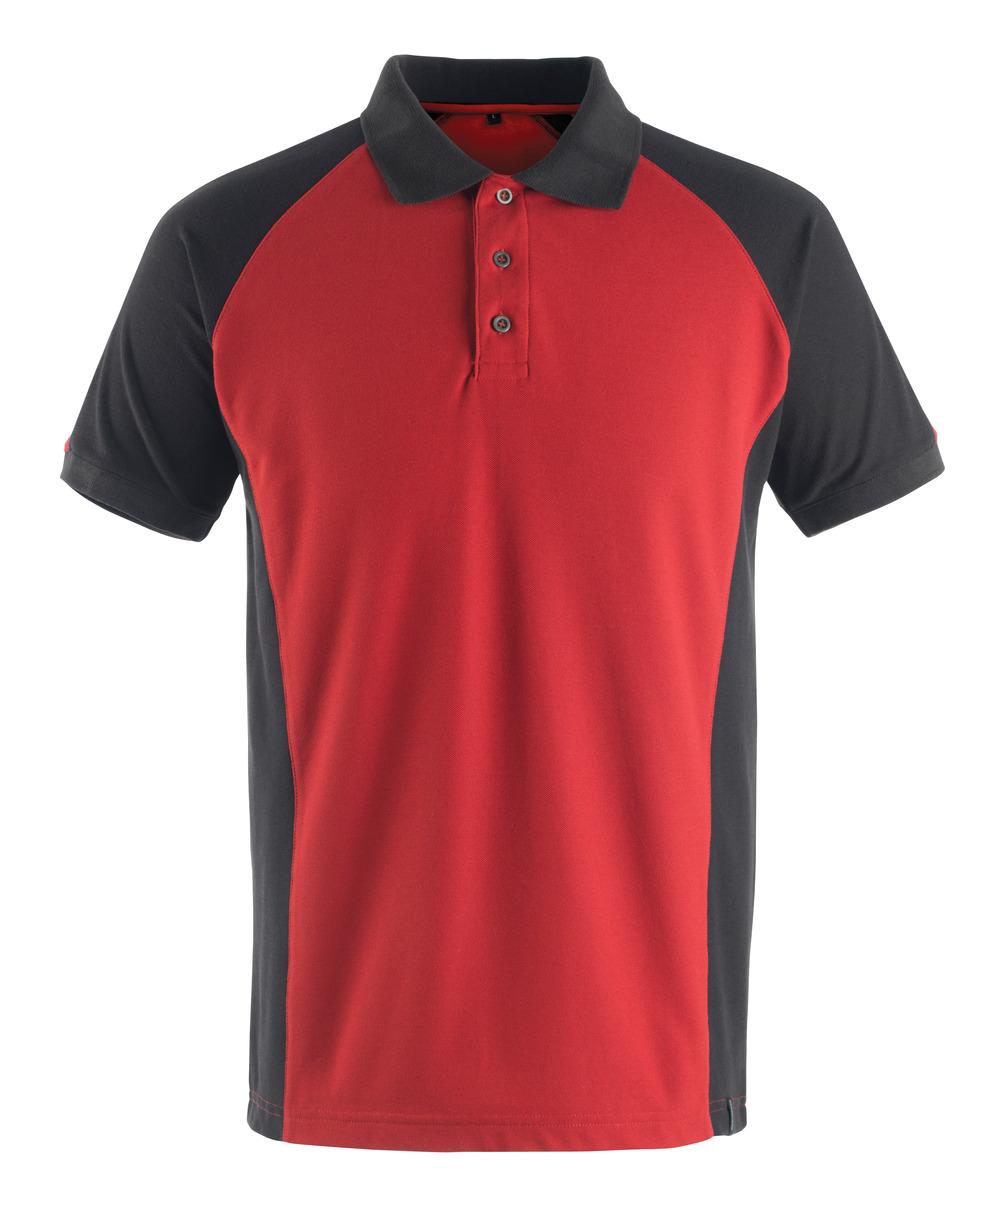 50569-961-0209 Pikéskjorte - rød/svart